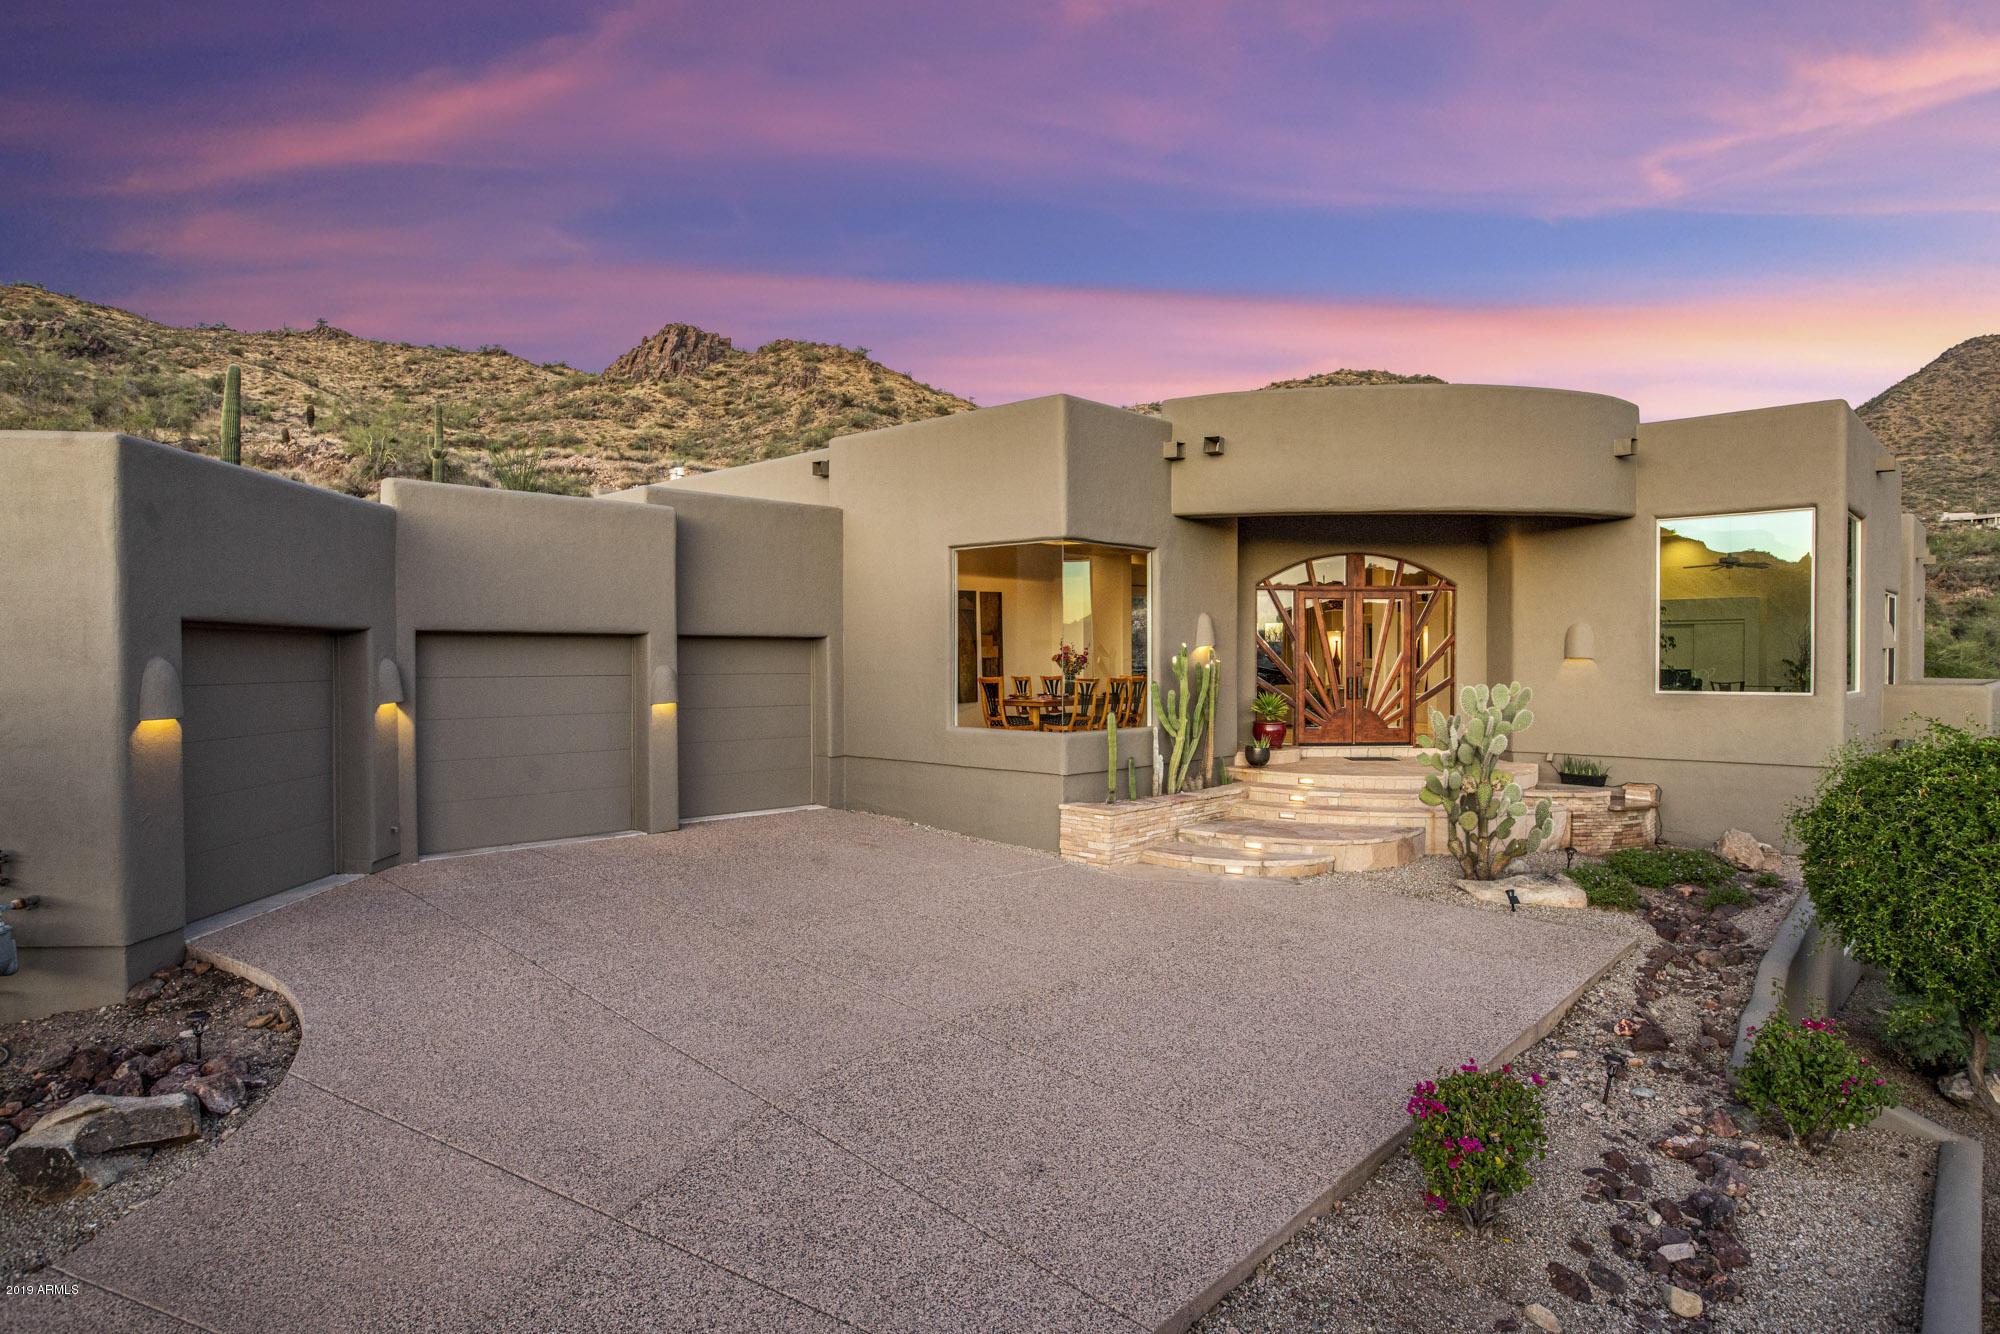 Photo of 14641 E SHADOW CANYON Drive, Fountain Hills, AZ 85268